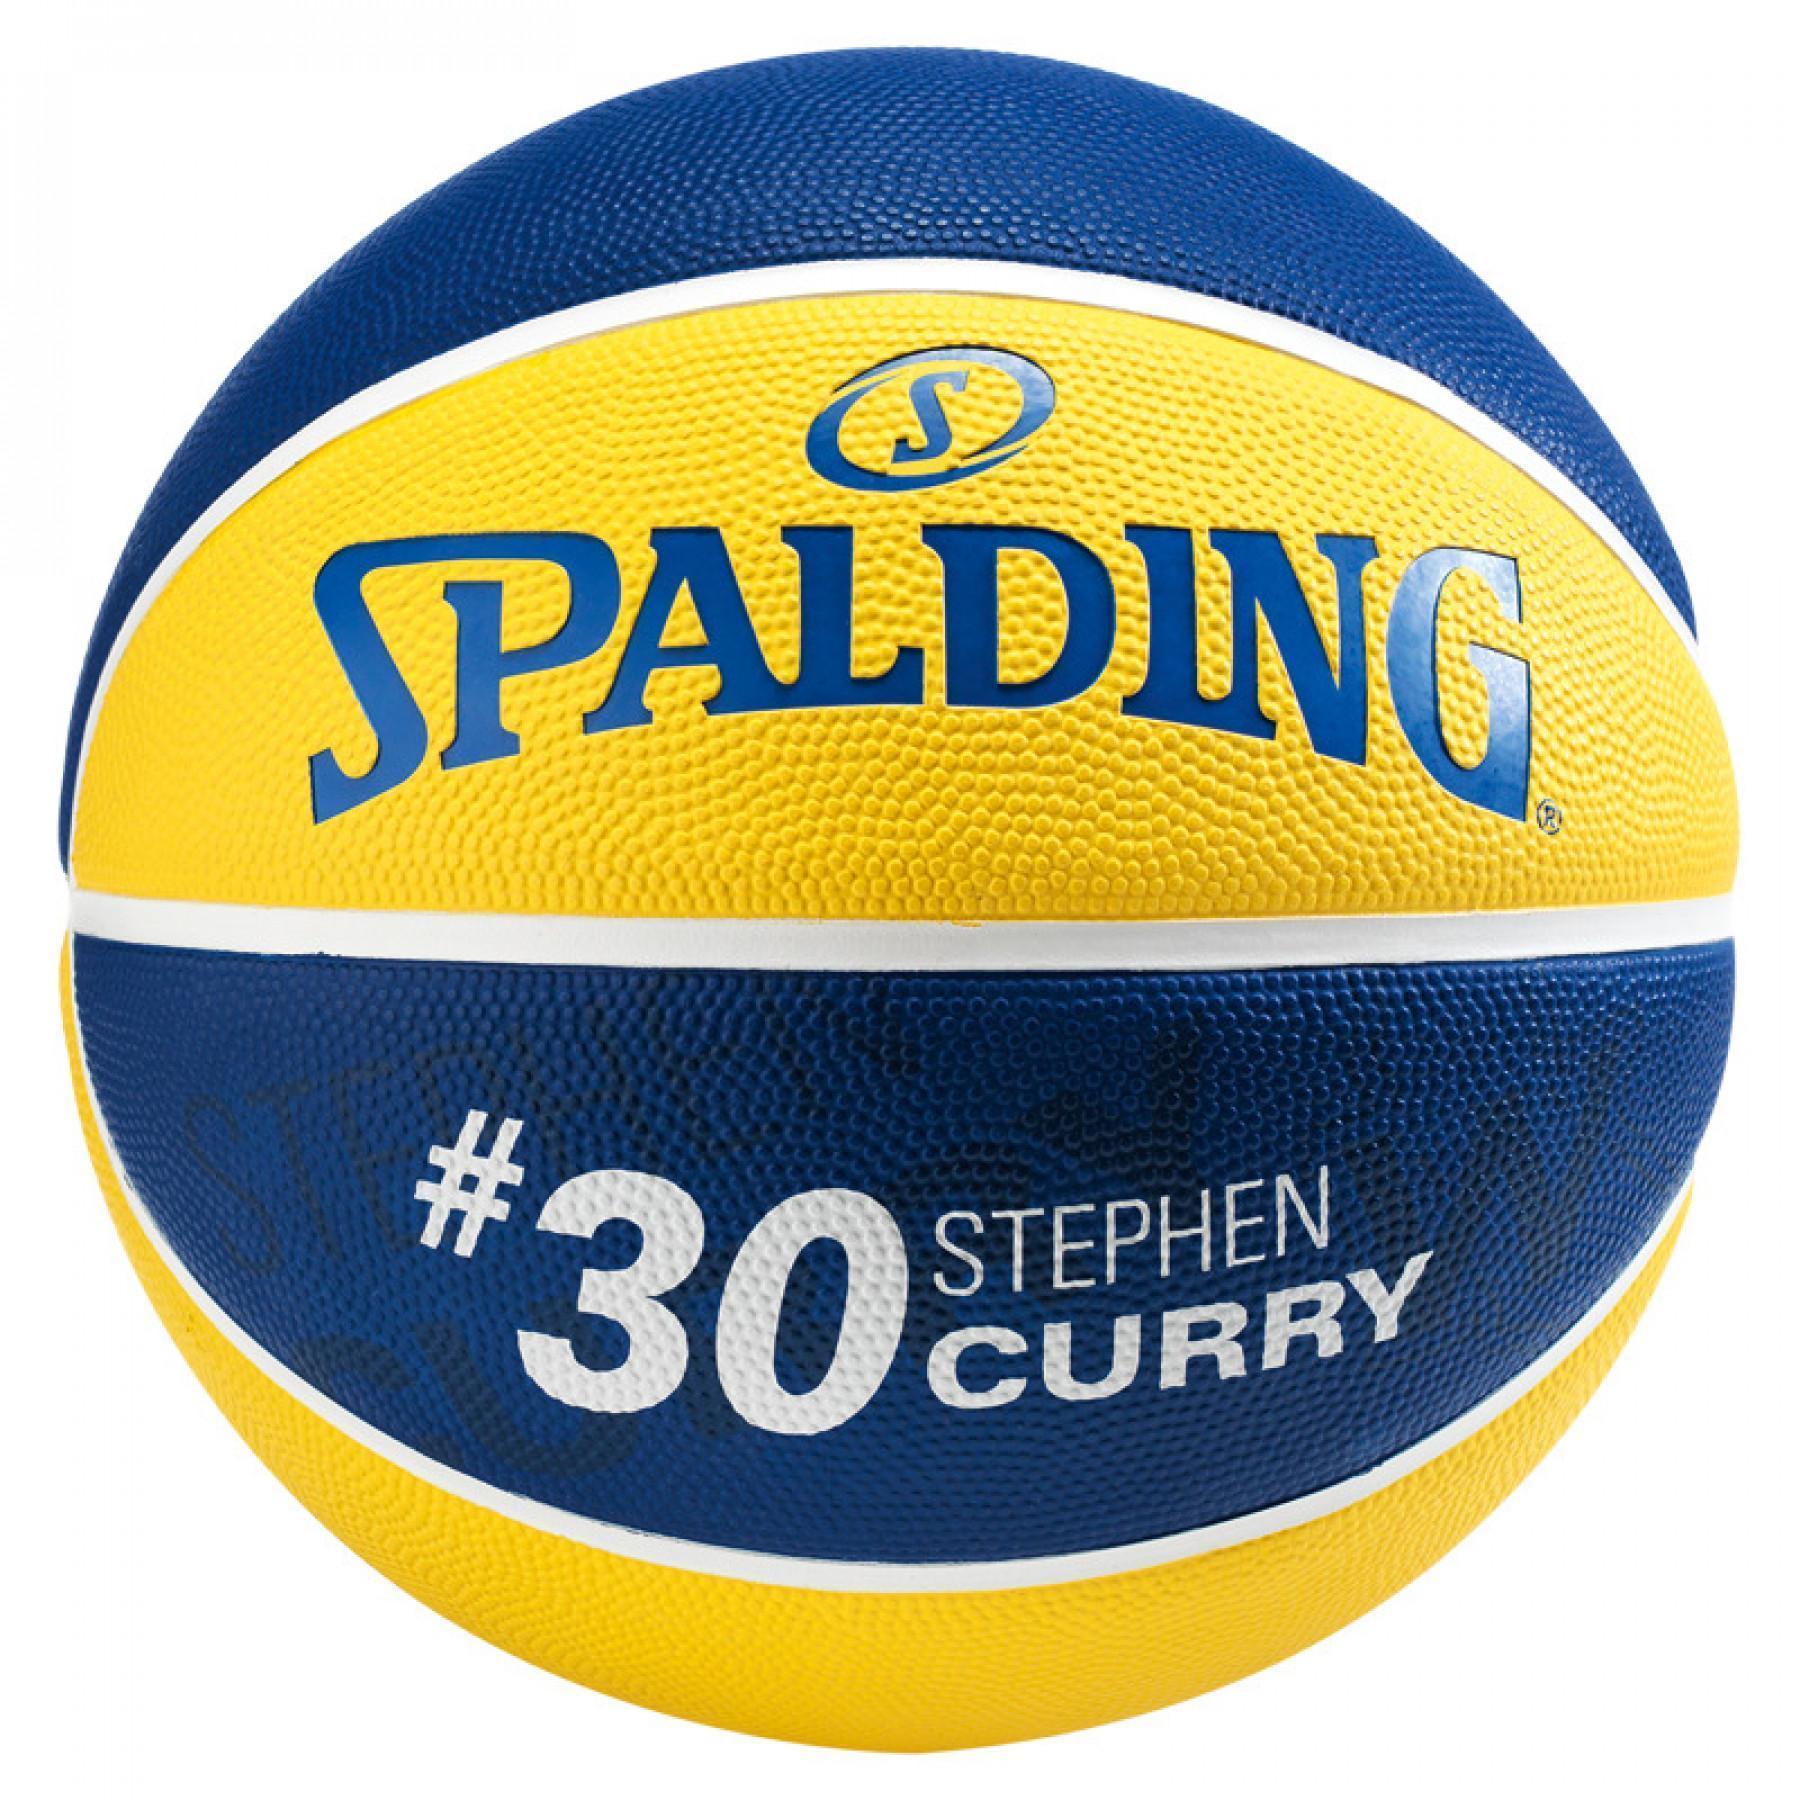 Balloon Spalding NBA Player Stephen Curry (83-844z)